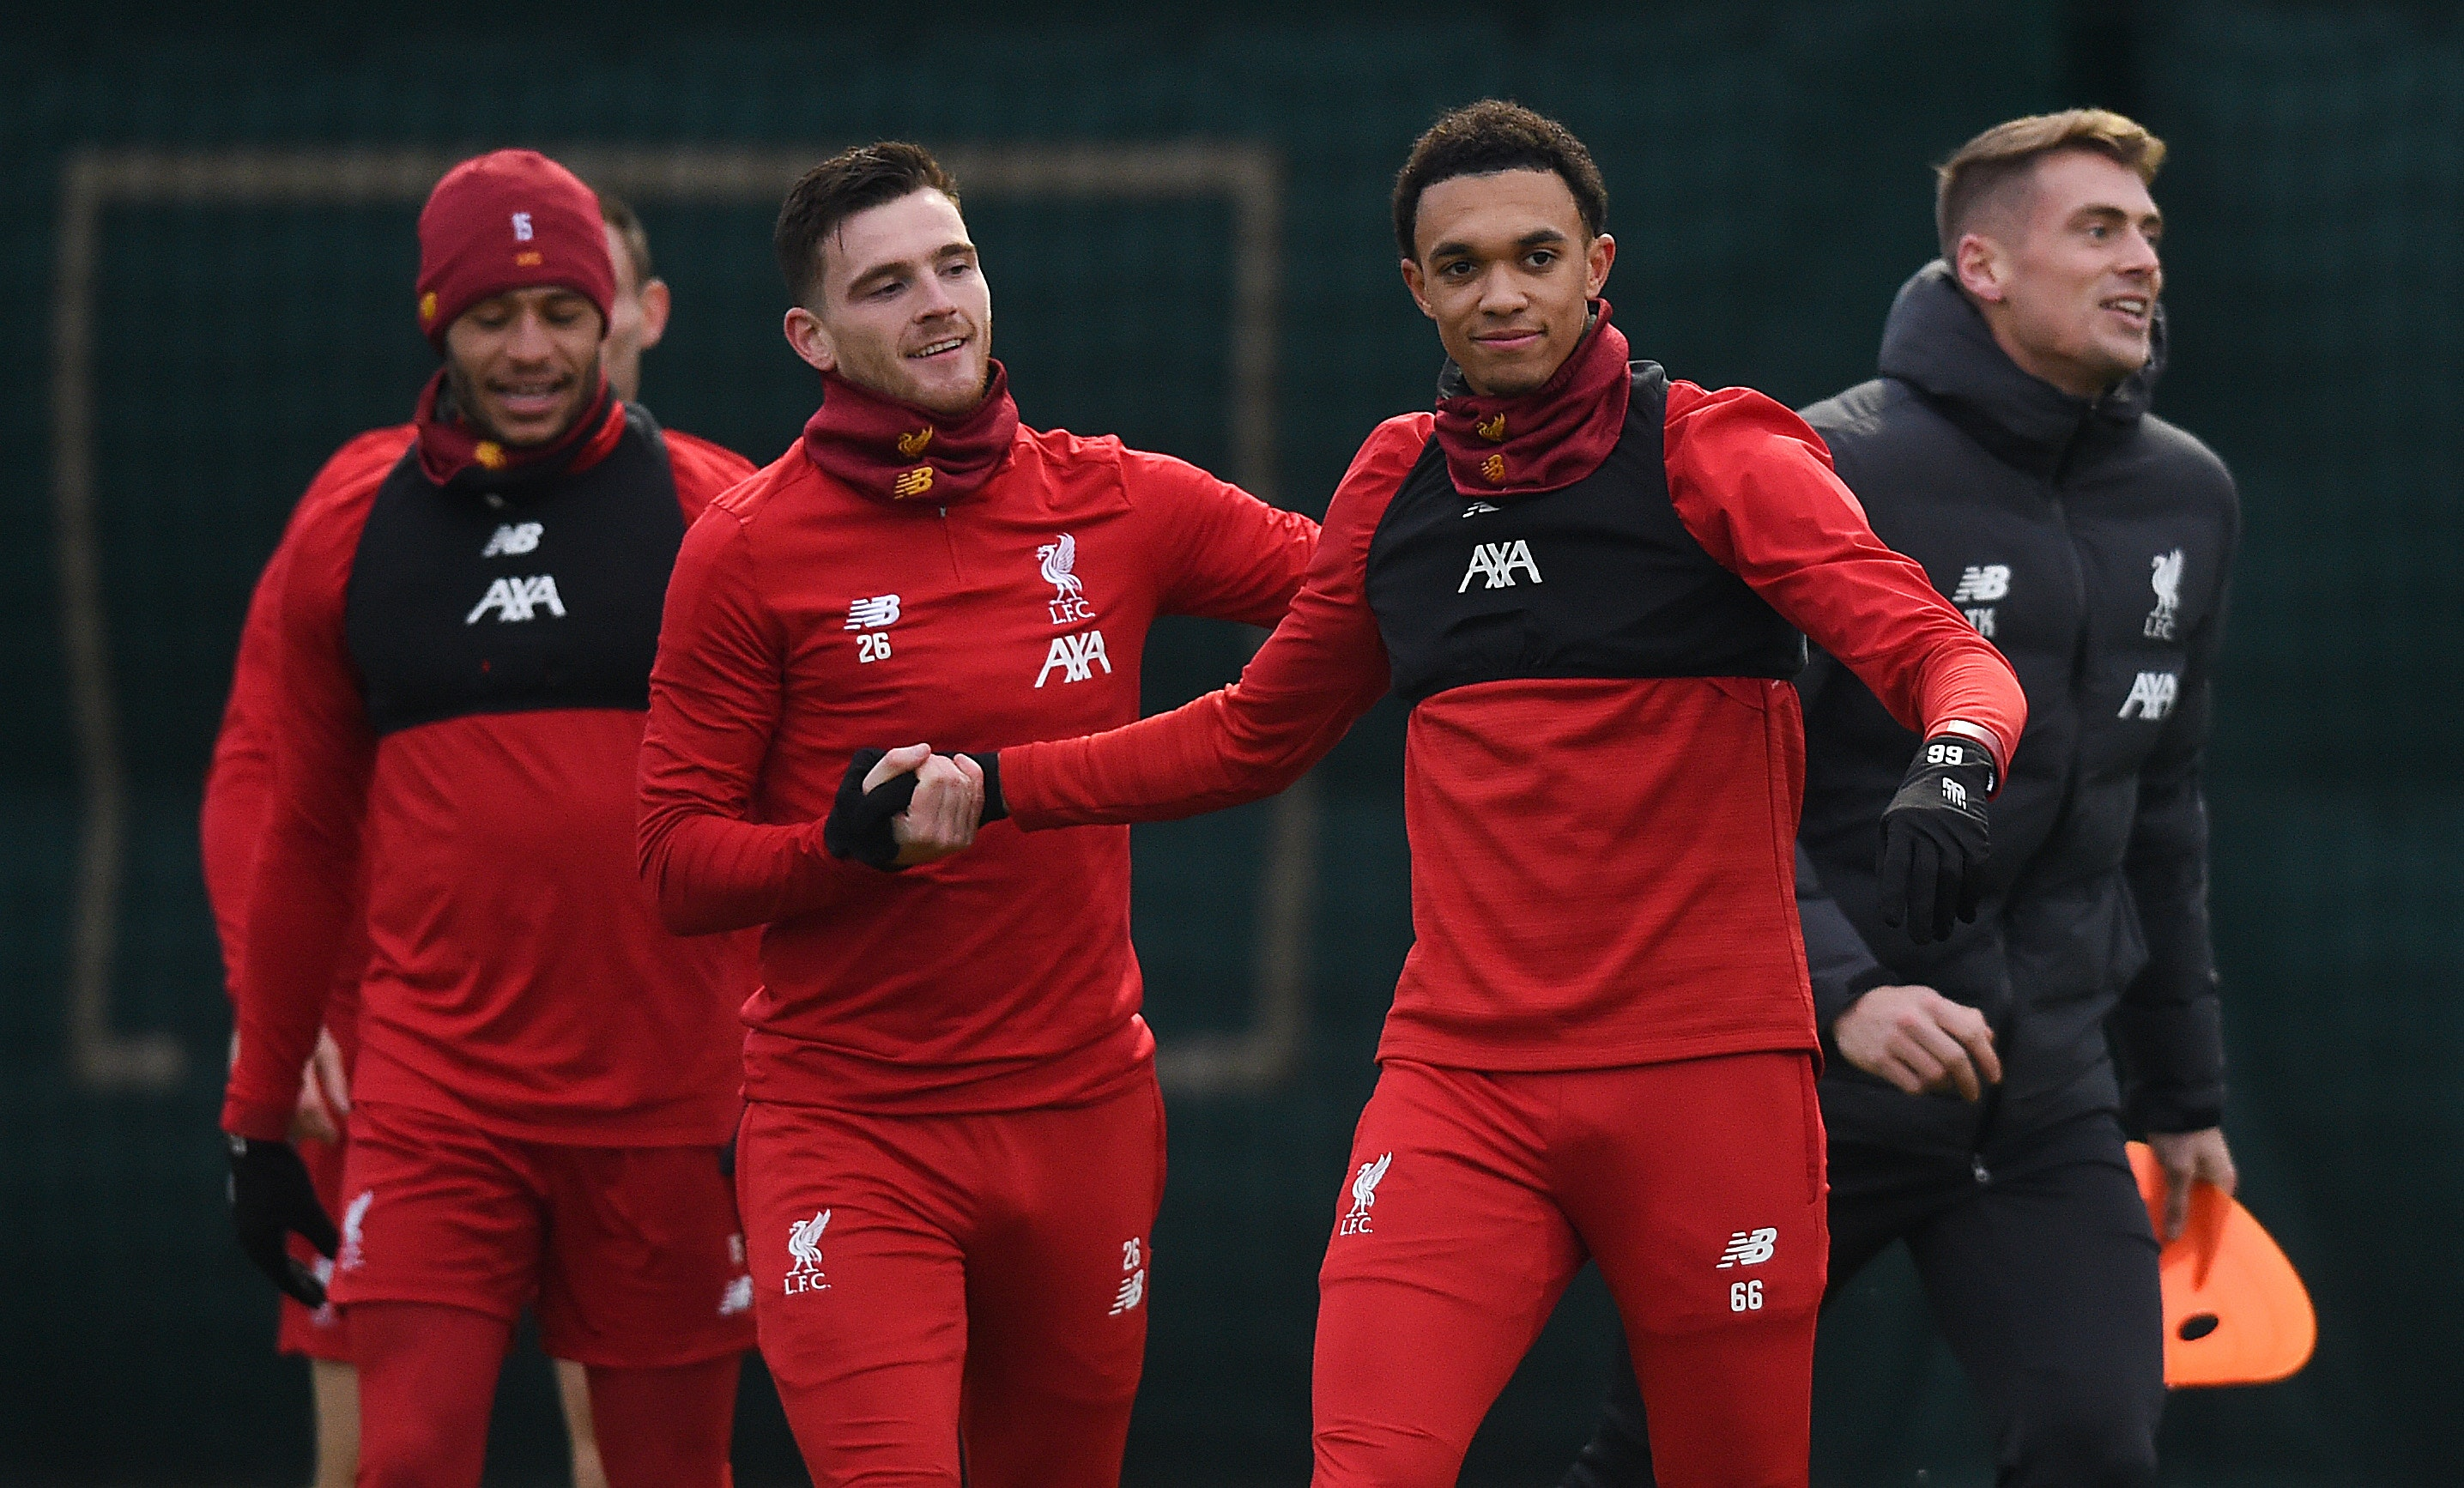 Slik holder Liverpool fokus i den intense tittelkampen